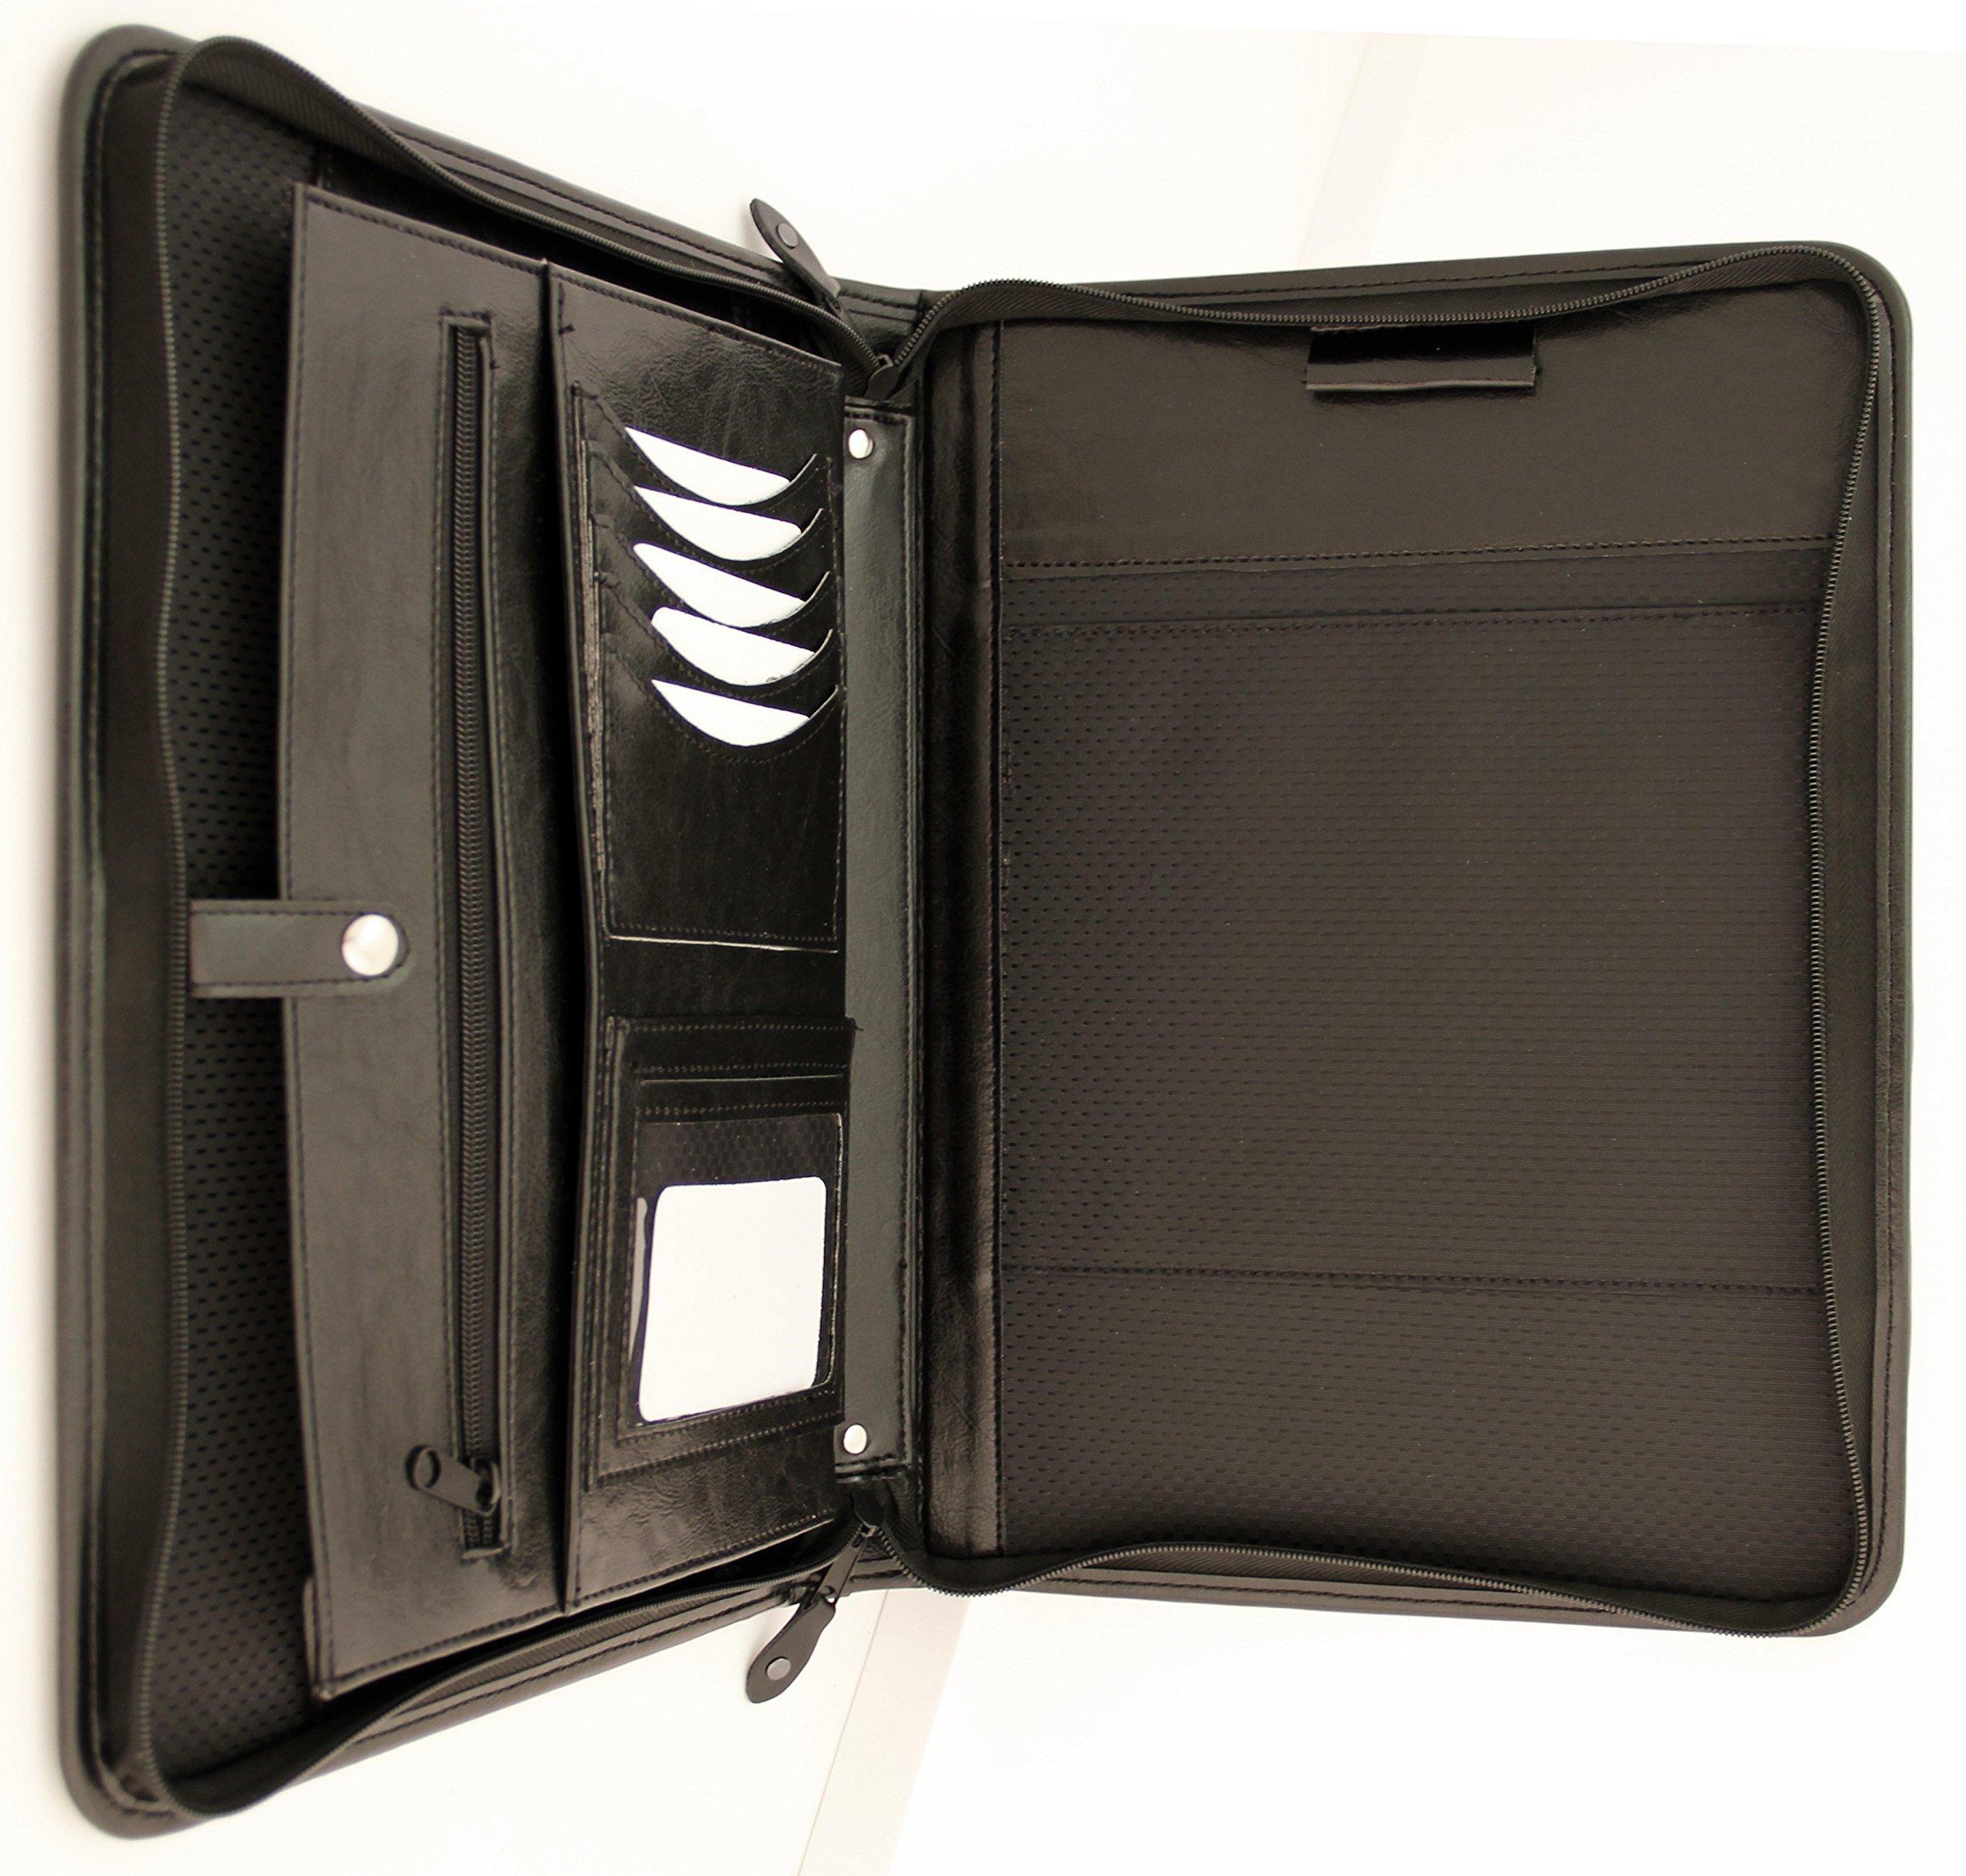 Noda Executive PU Leather Padfolio Professional Business Portfolio w/ Zippered Closure | Resume, Document, Notepad, Tablet, Writing Pad Organizer | Men, Women (Black)